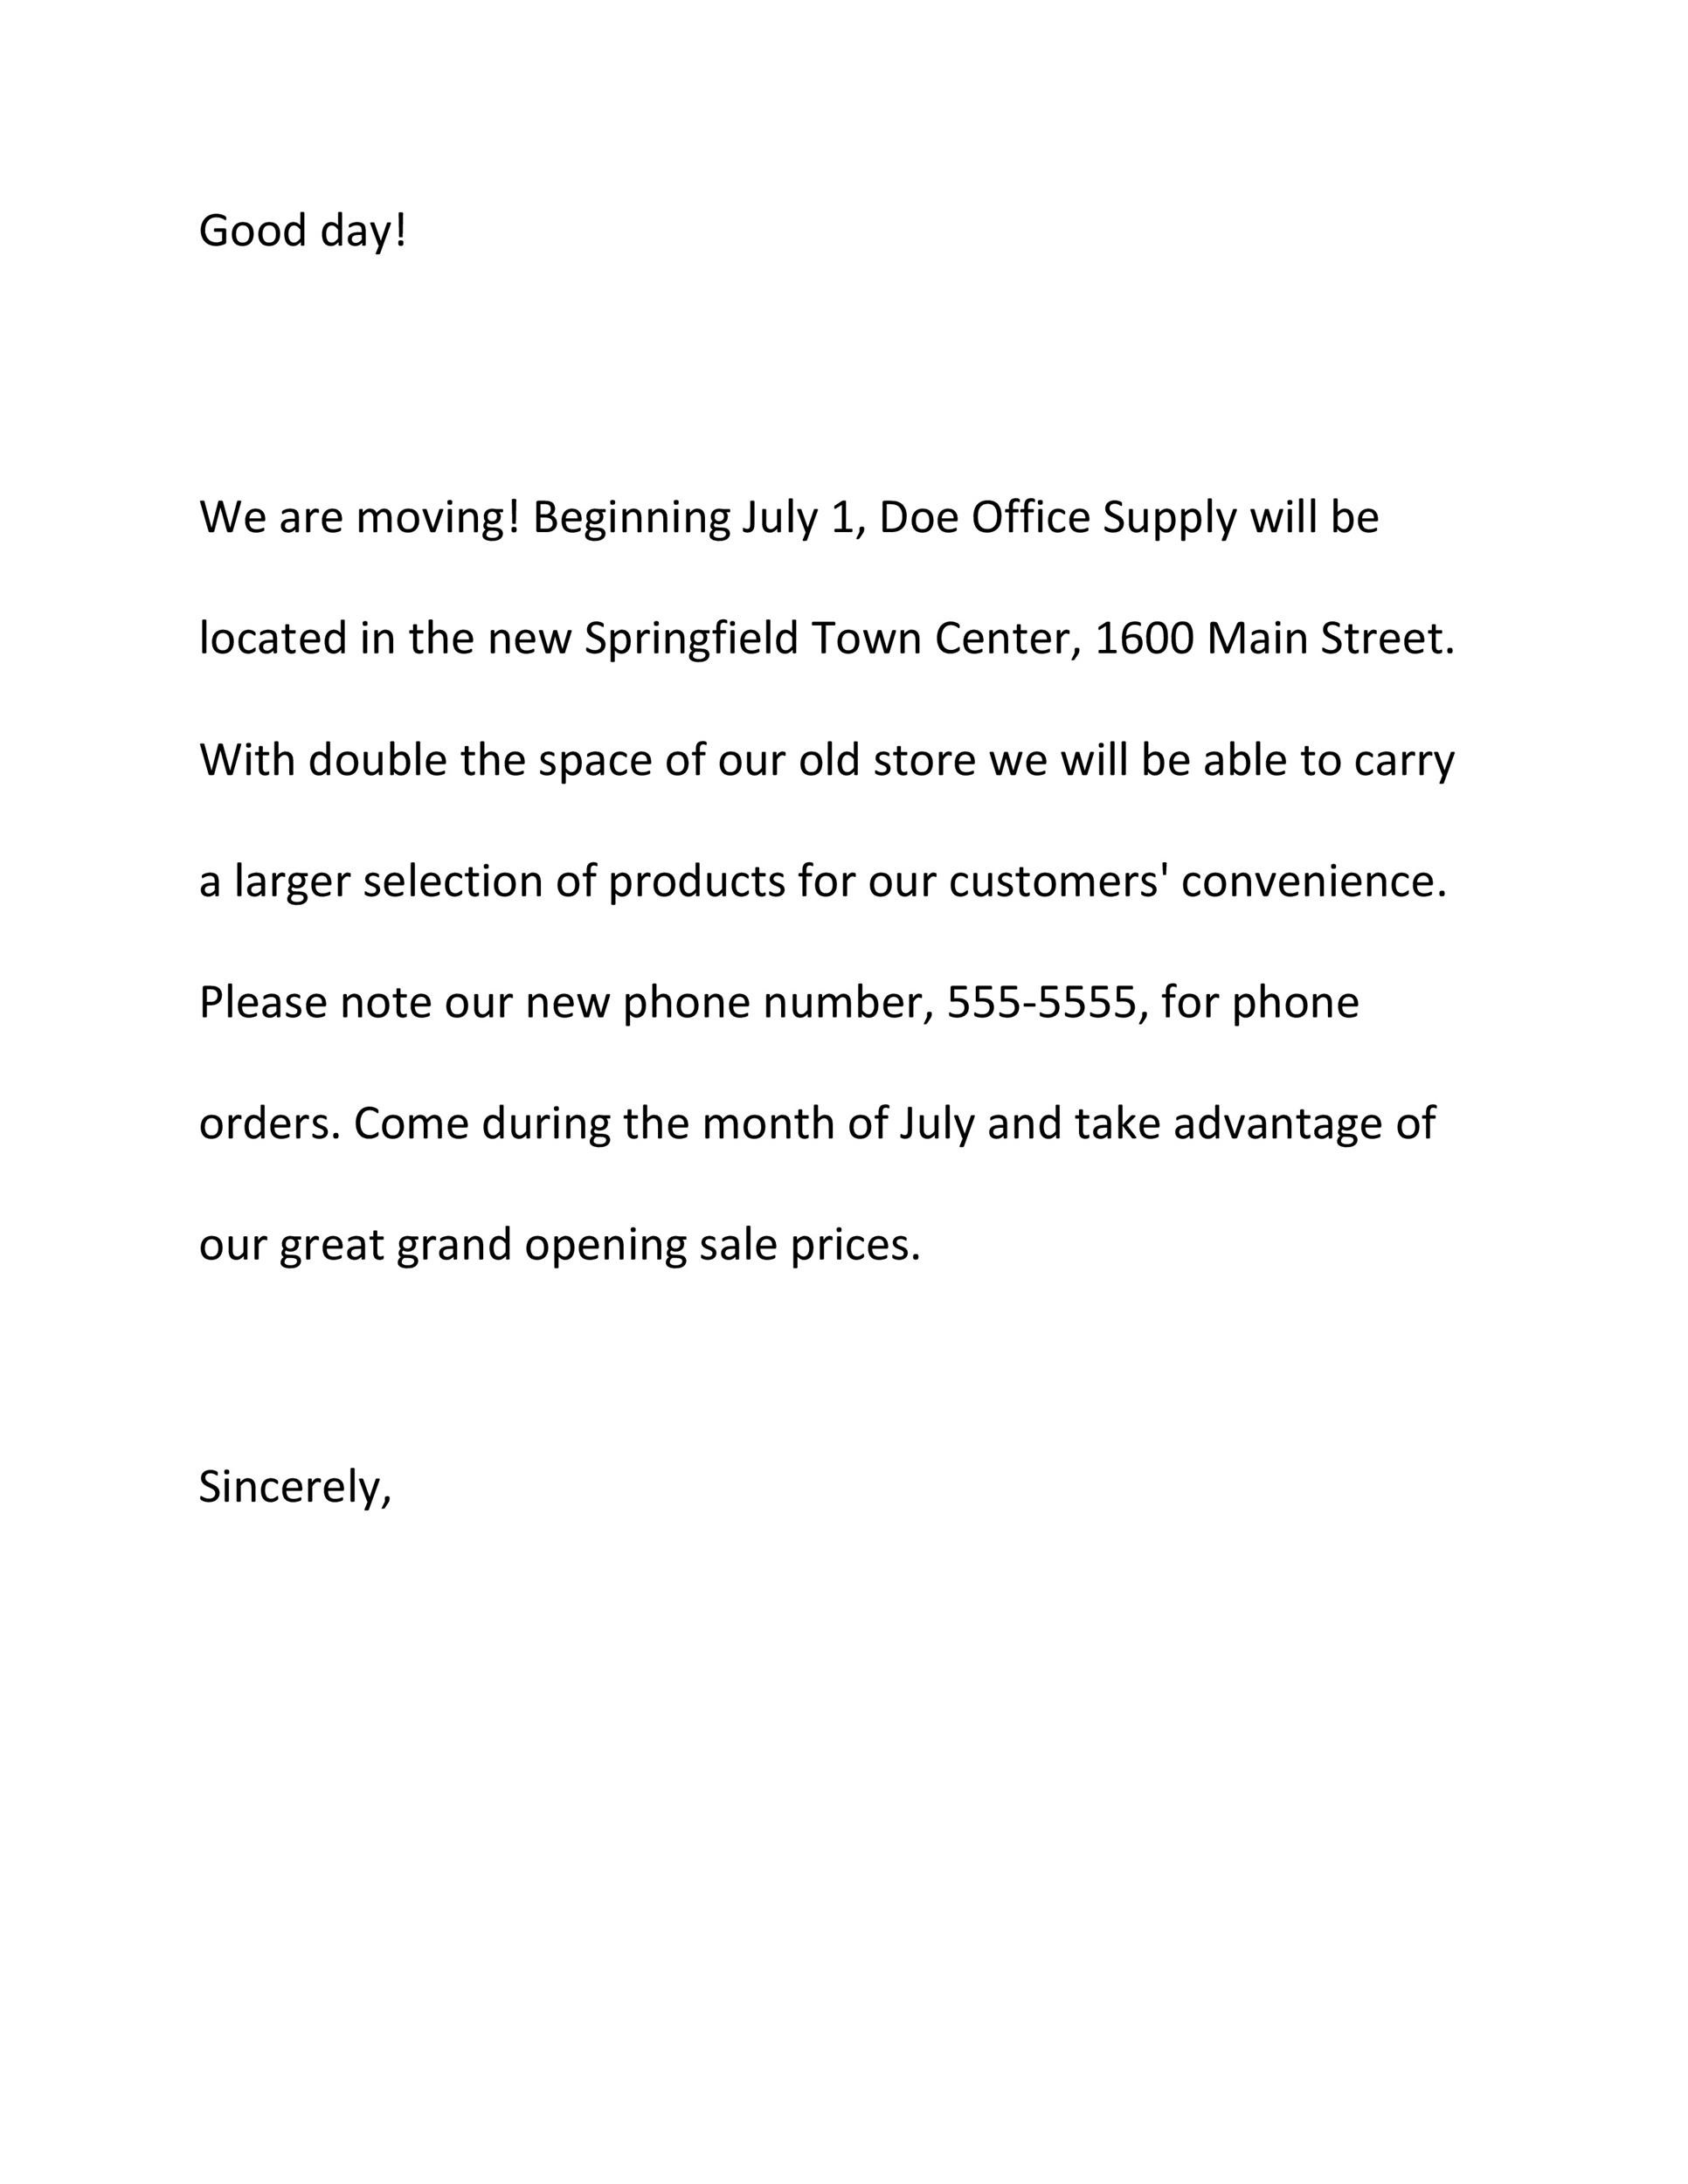 Free change of address letter 33